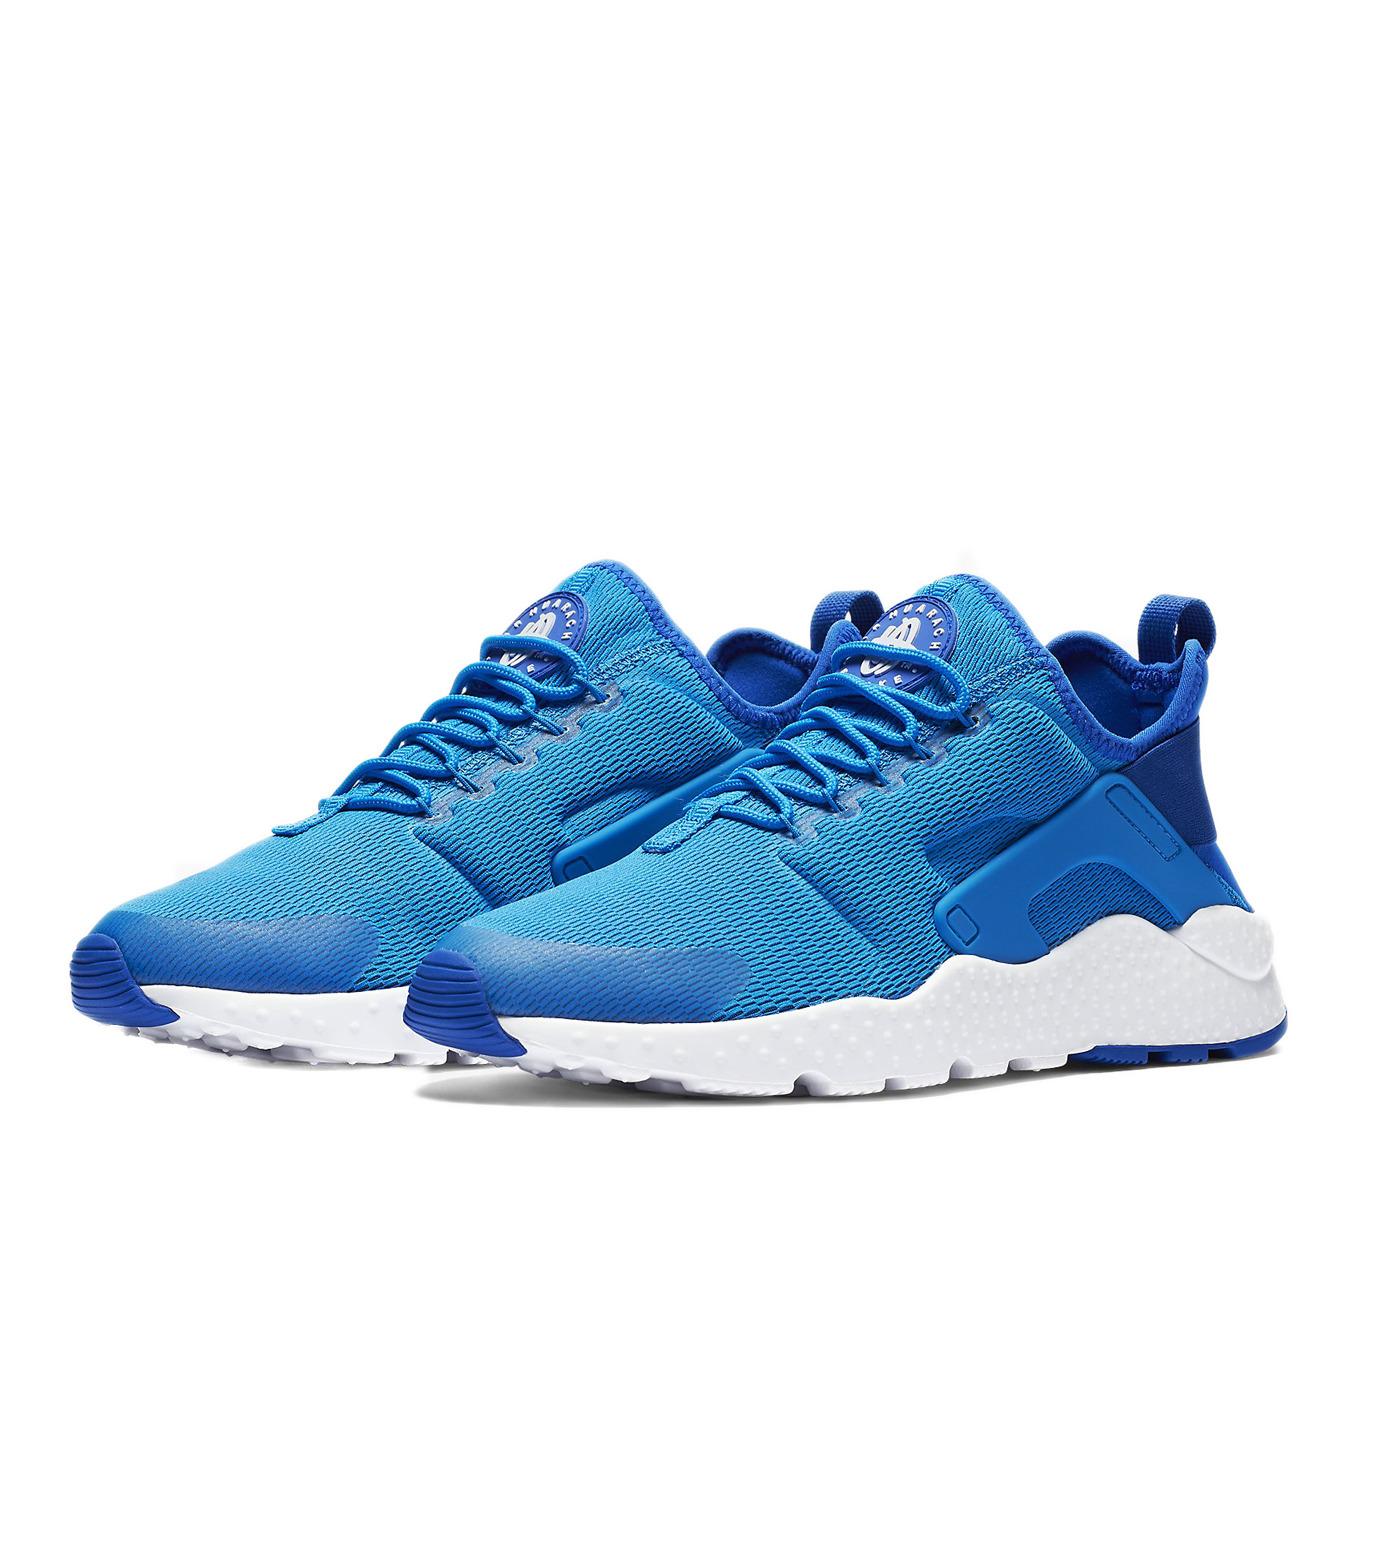 NIKE(ナイキ)のAIR HUARACHE RUN-BLUE(シューズ/shoes)-819151-400-92 拡大詳細画像3